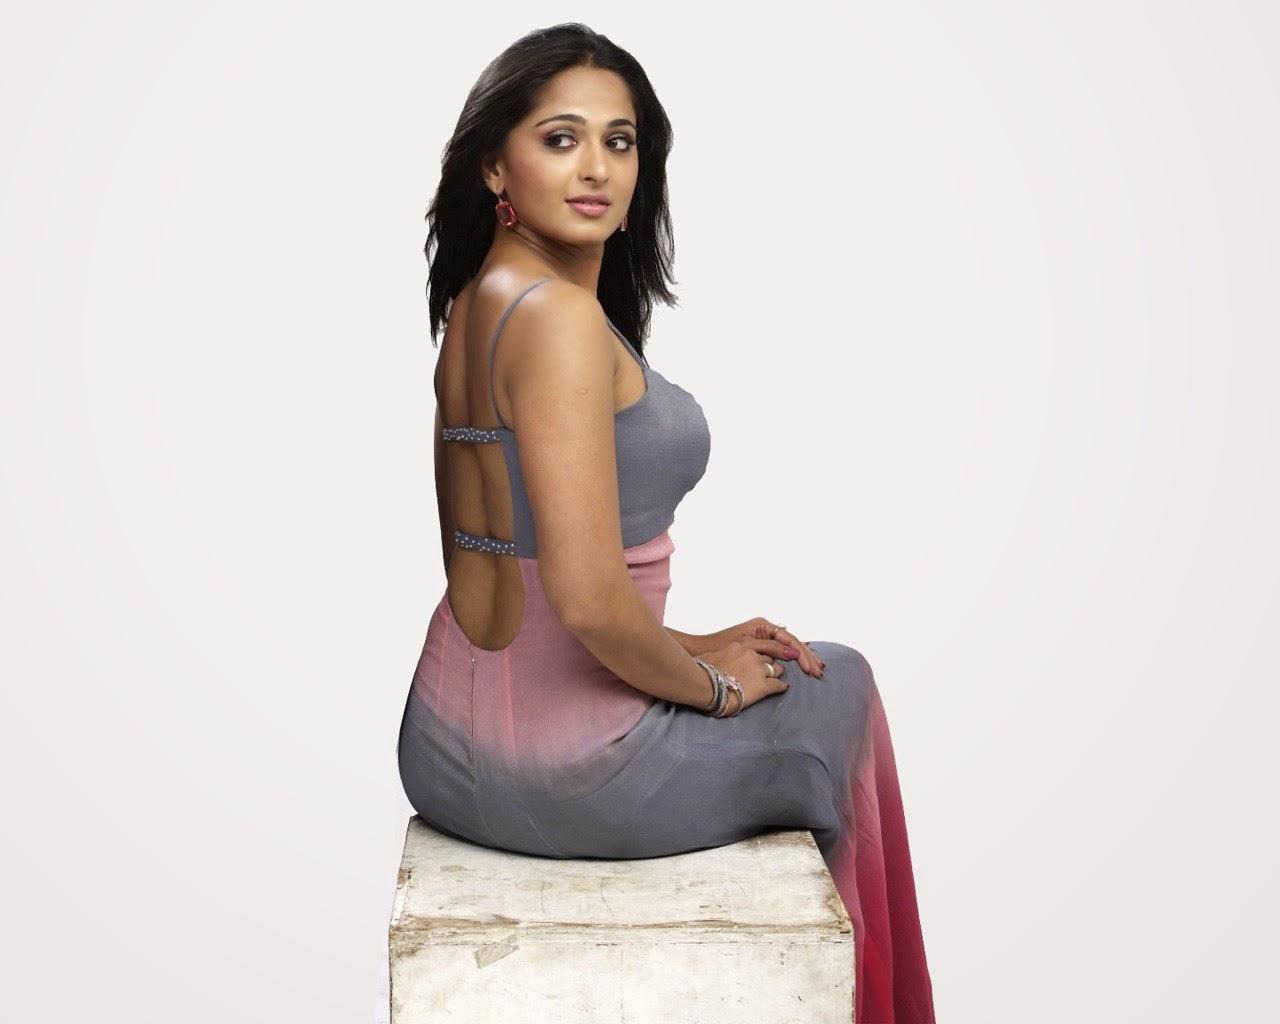 Anushka shetty back pose hot actress wallpapers